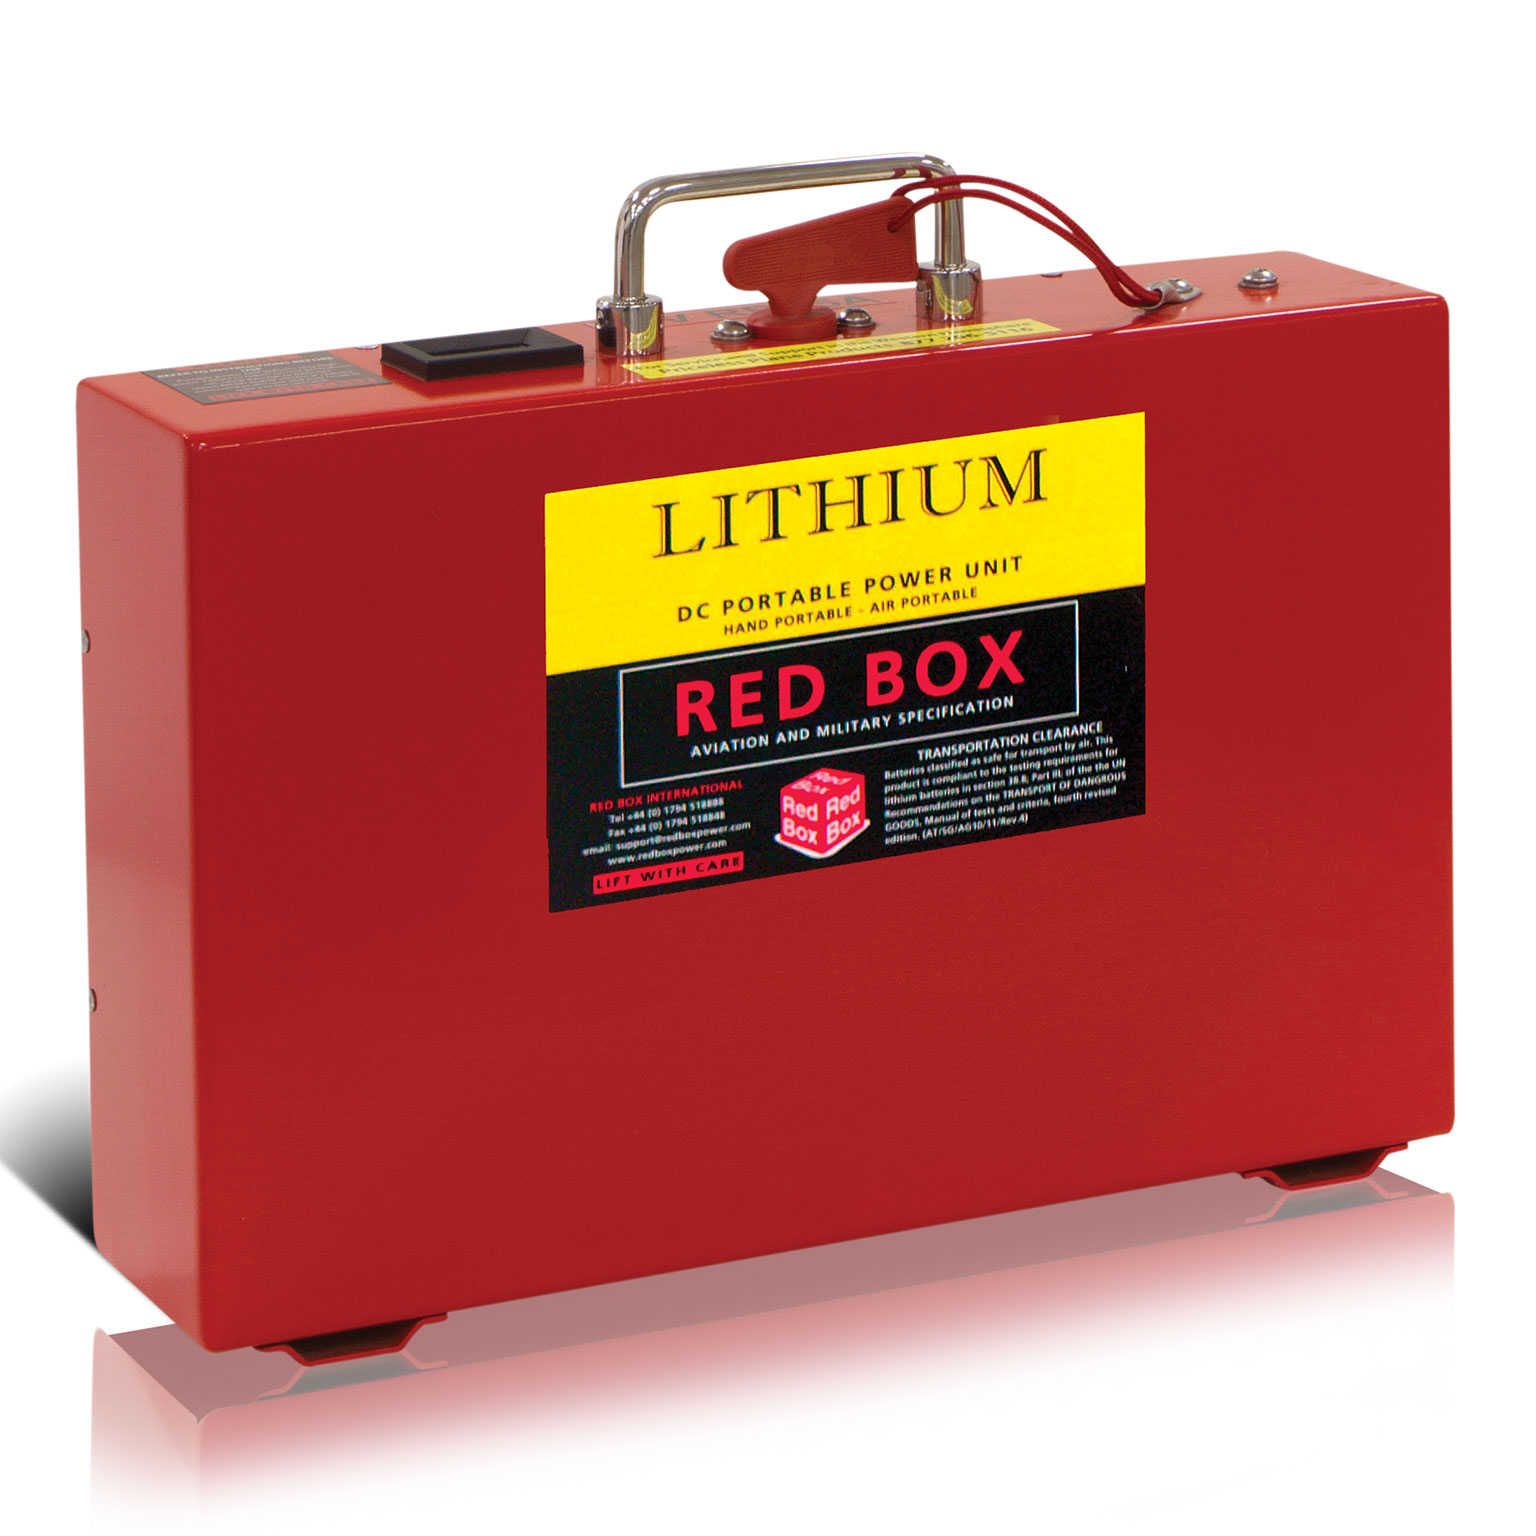 RBL2500 Lithium Start Power Unit